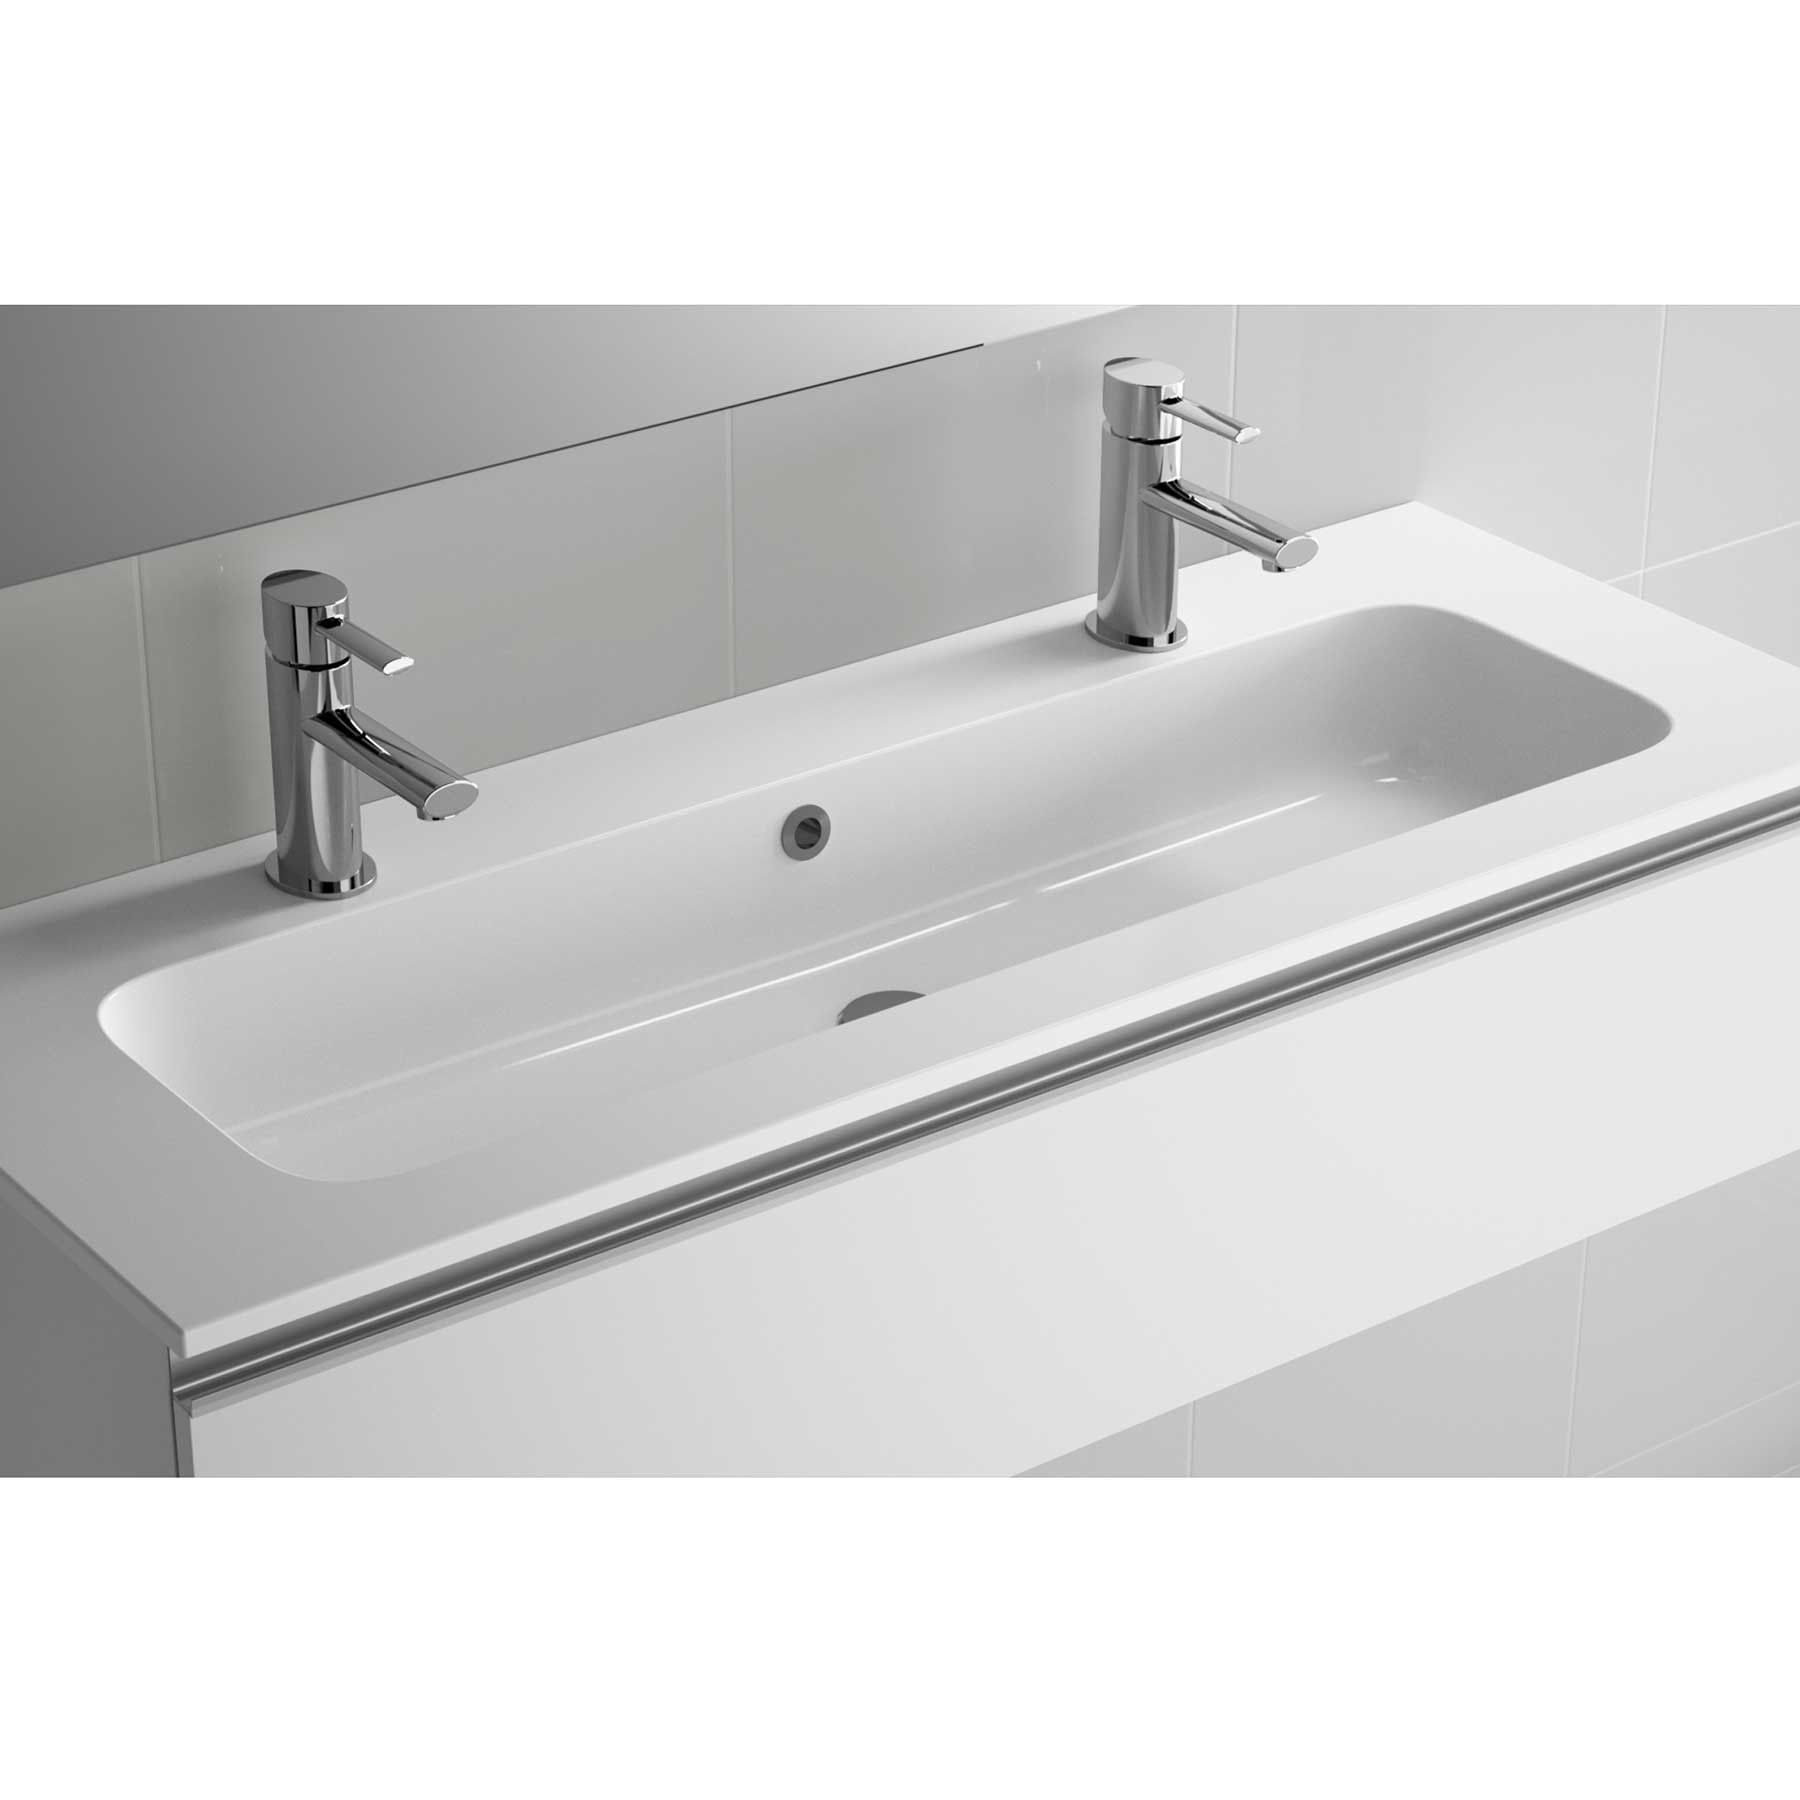 basin sofia 1205 1 sink and 2 taps mineralmarmo 1205 x 15 x 460 mm